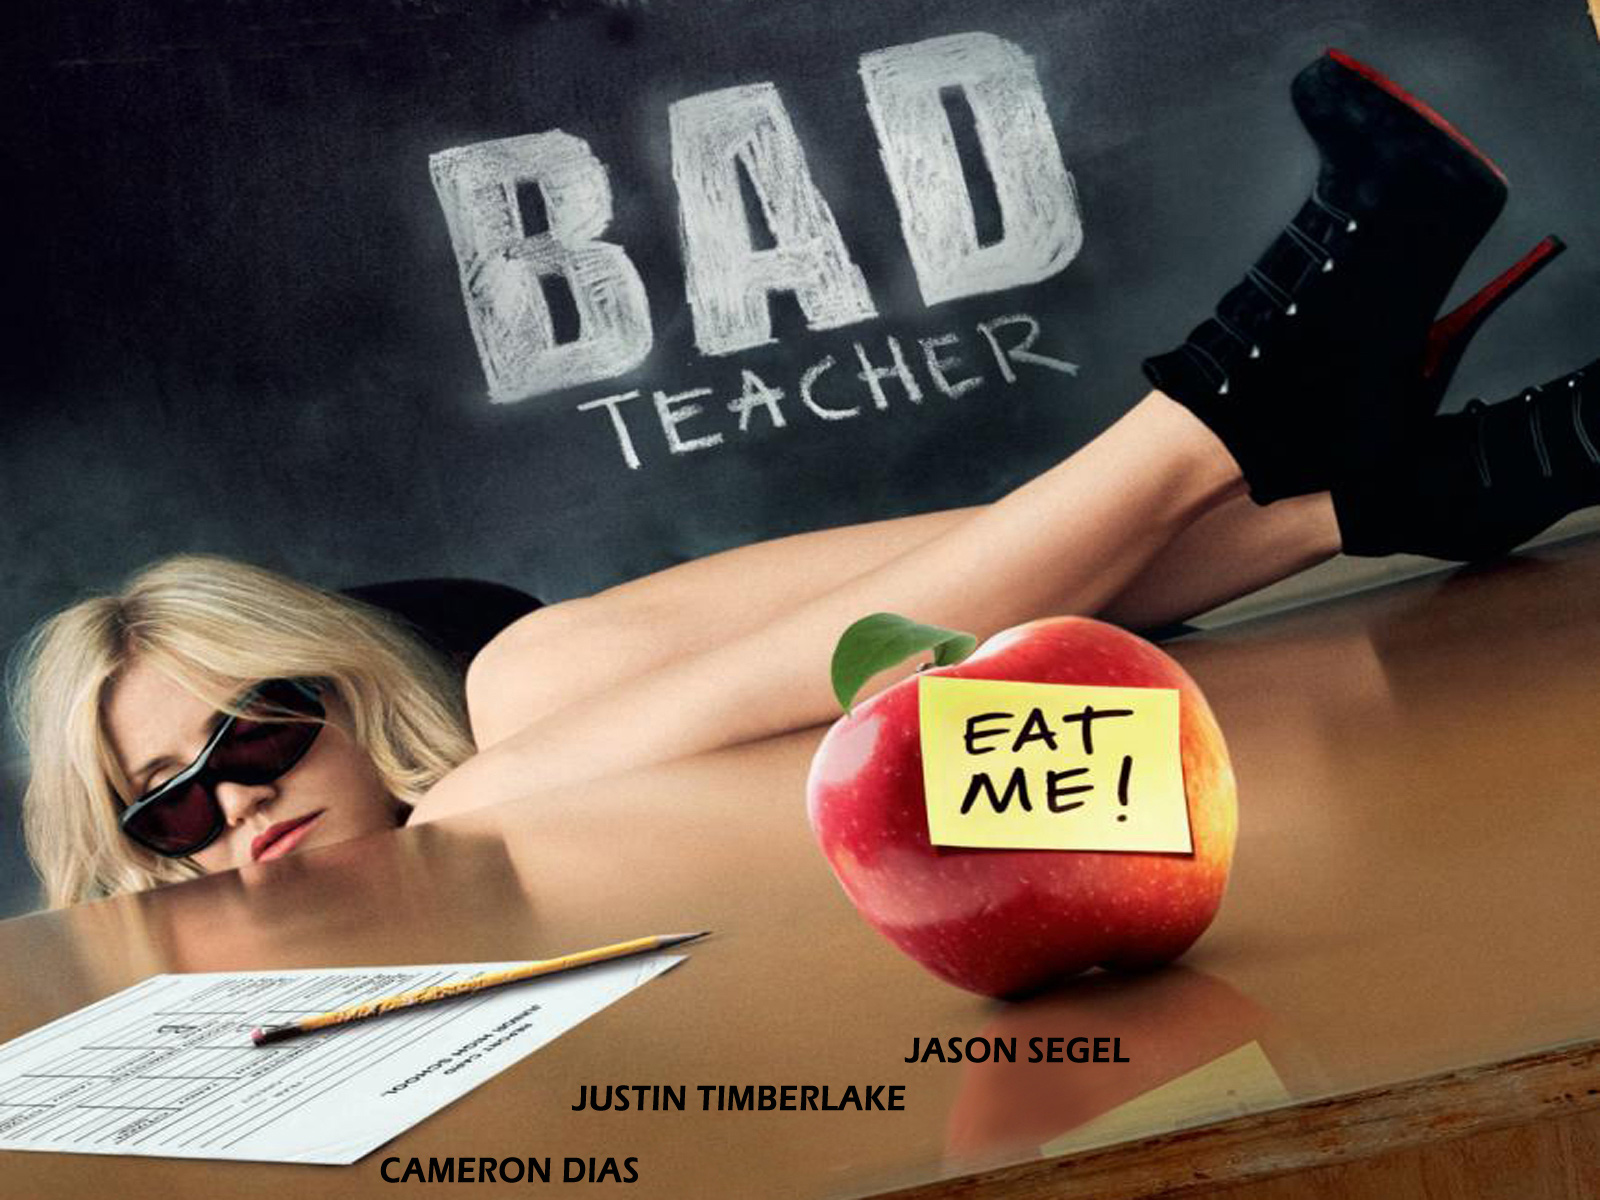 Bad Teacher Movie Image